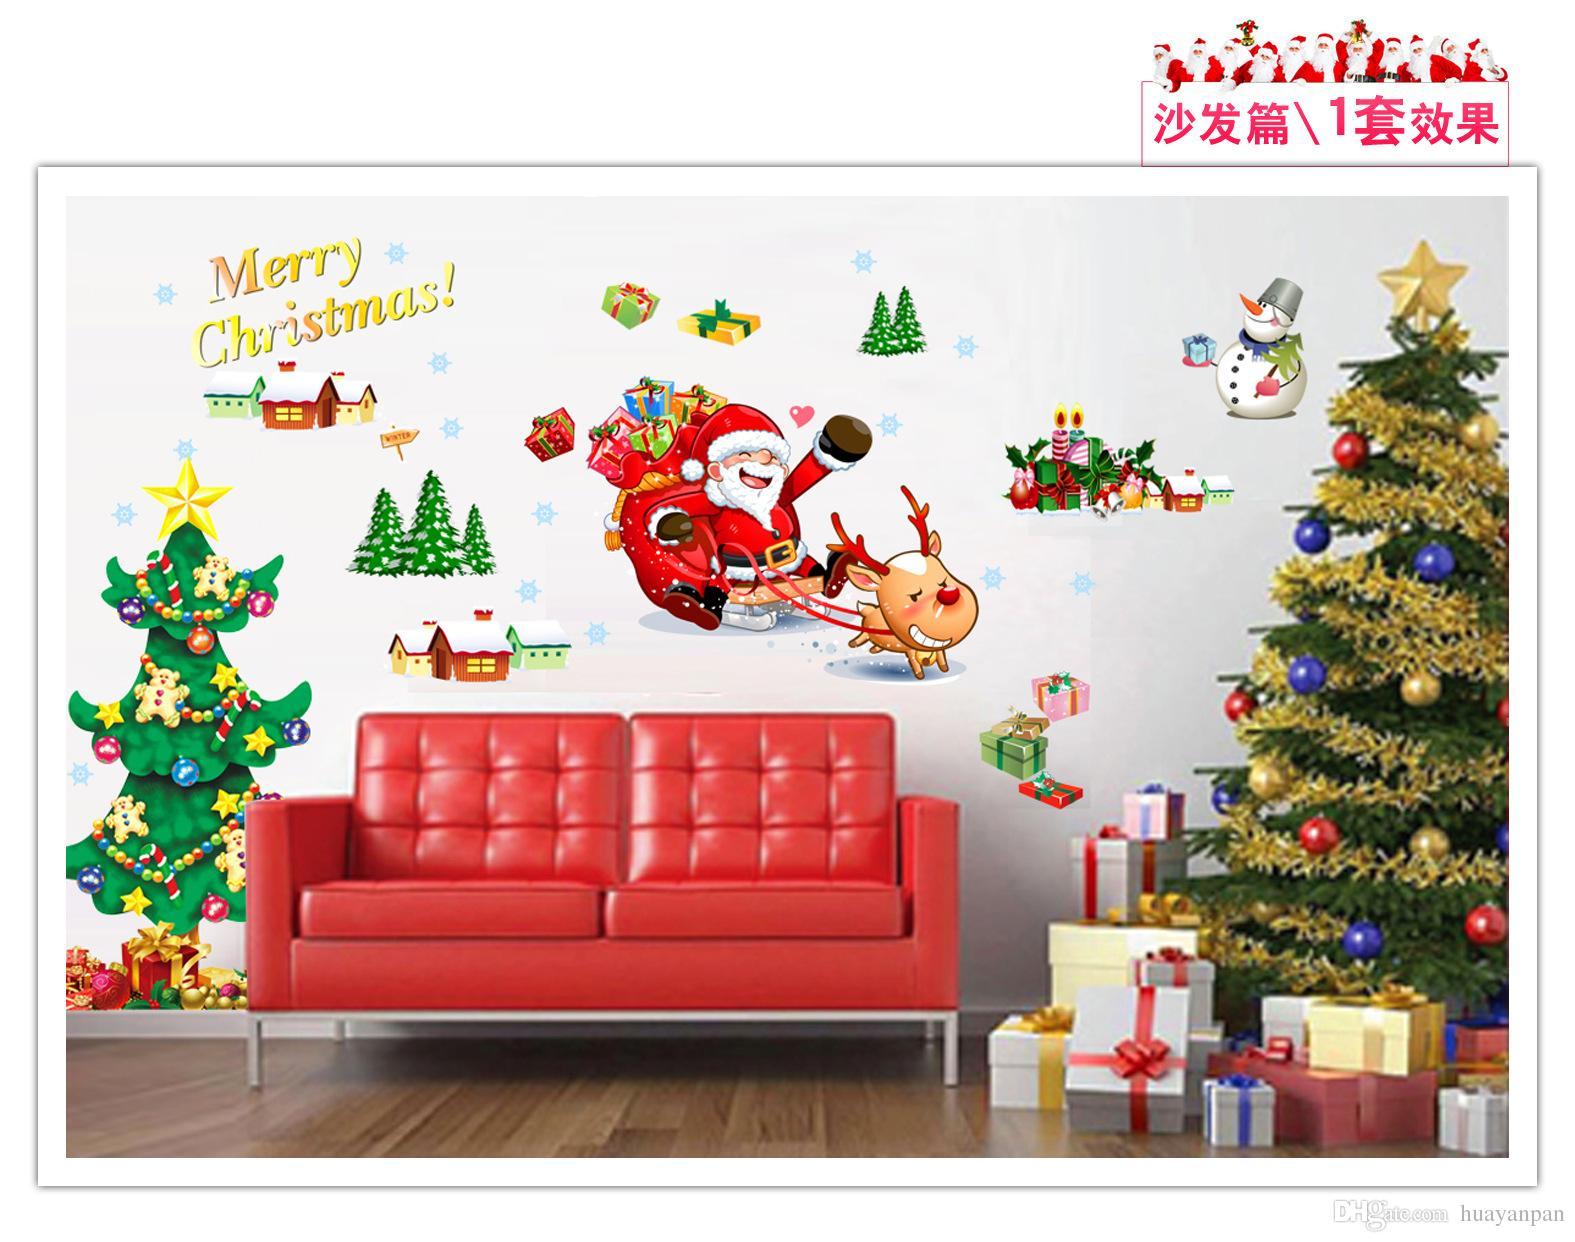 Hot Christmas Tree Wall Sticke The Santa Claus Wall Sticke - Christmas wall decals removable